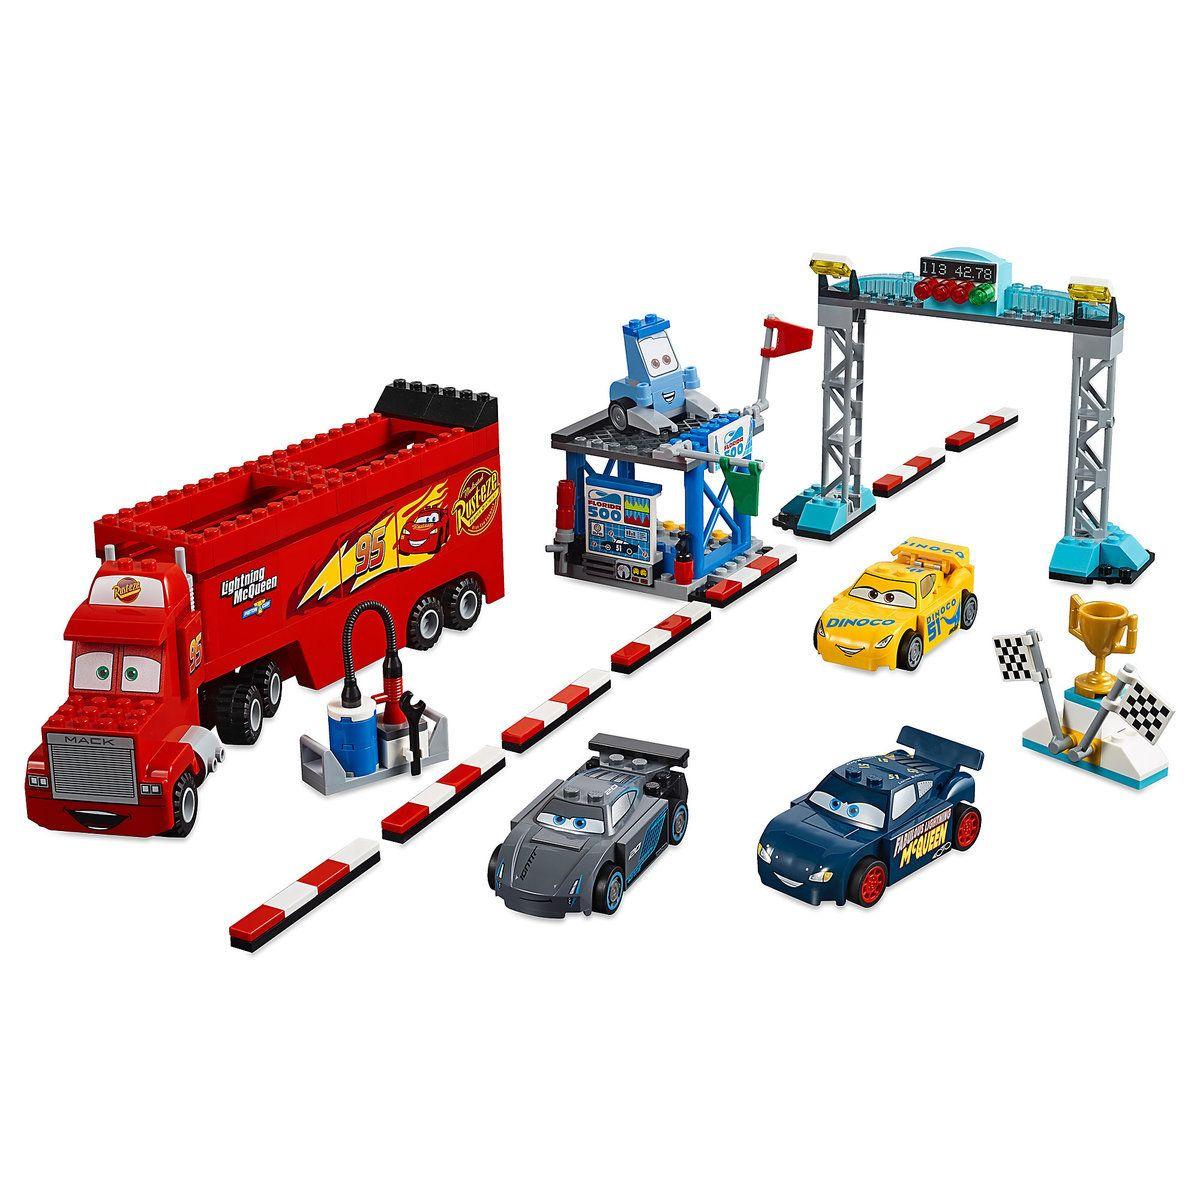 Florida 500 Final Race Playset by LEGO Juniors Cars 3